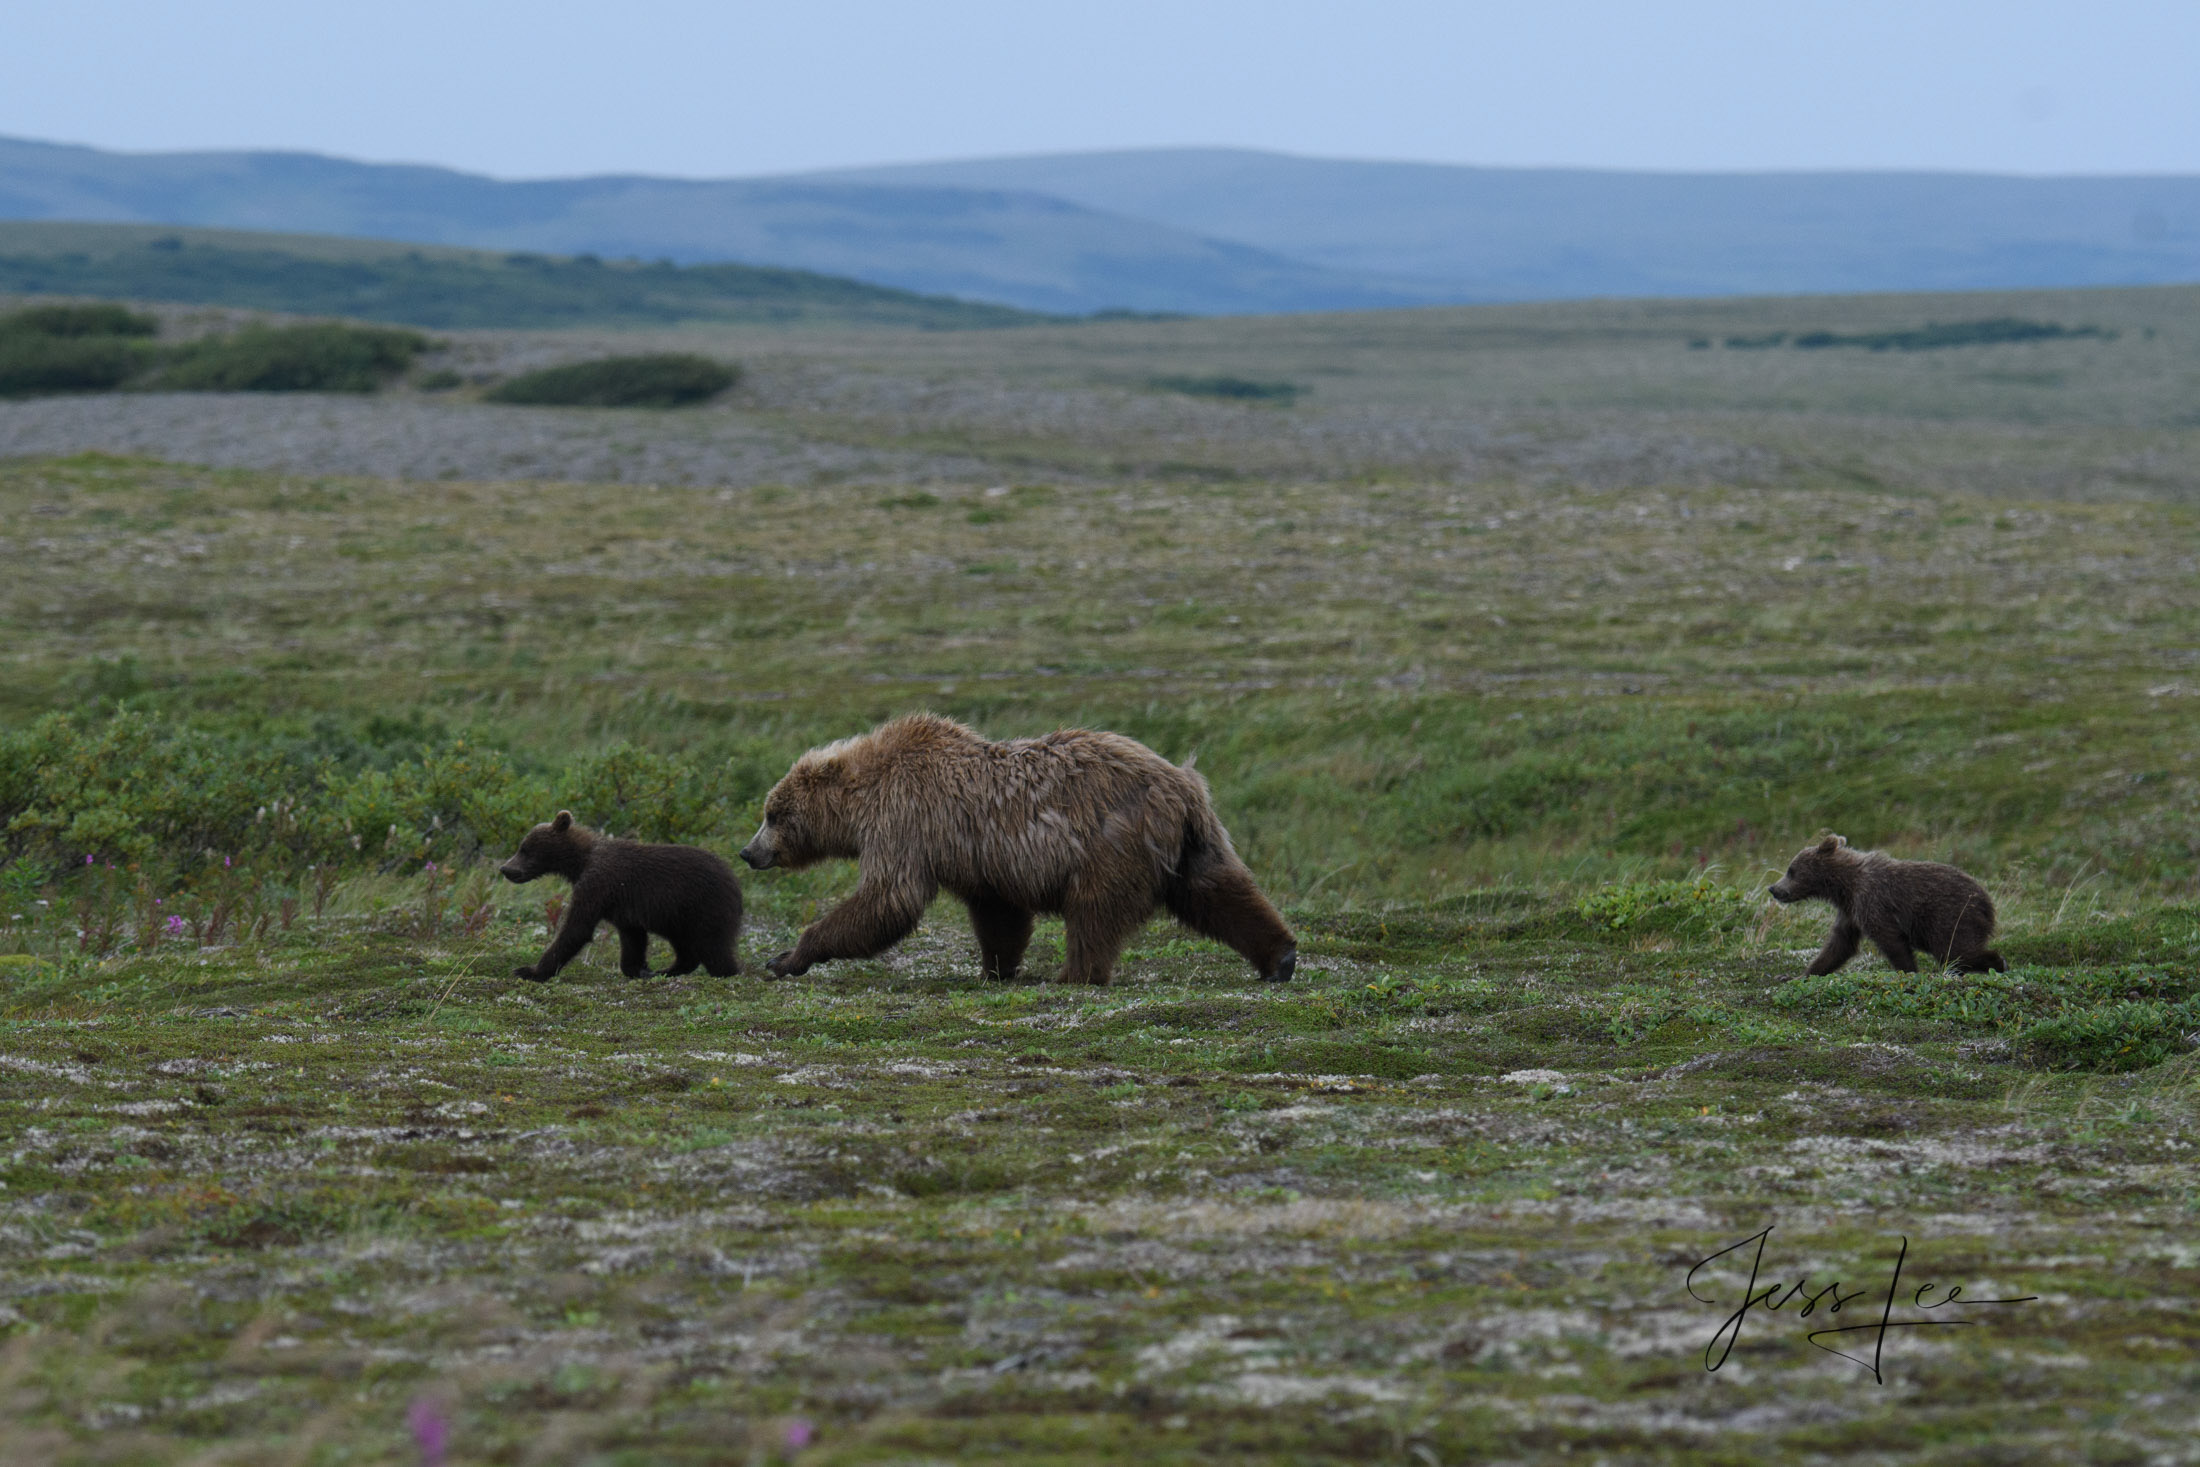 cubs, sow, mother, Katmai, bears, , Bear, grizzle, fishing, salmon, photo